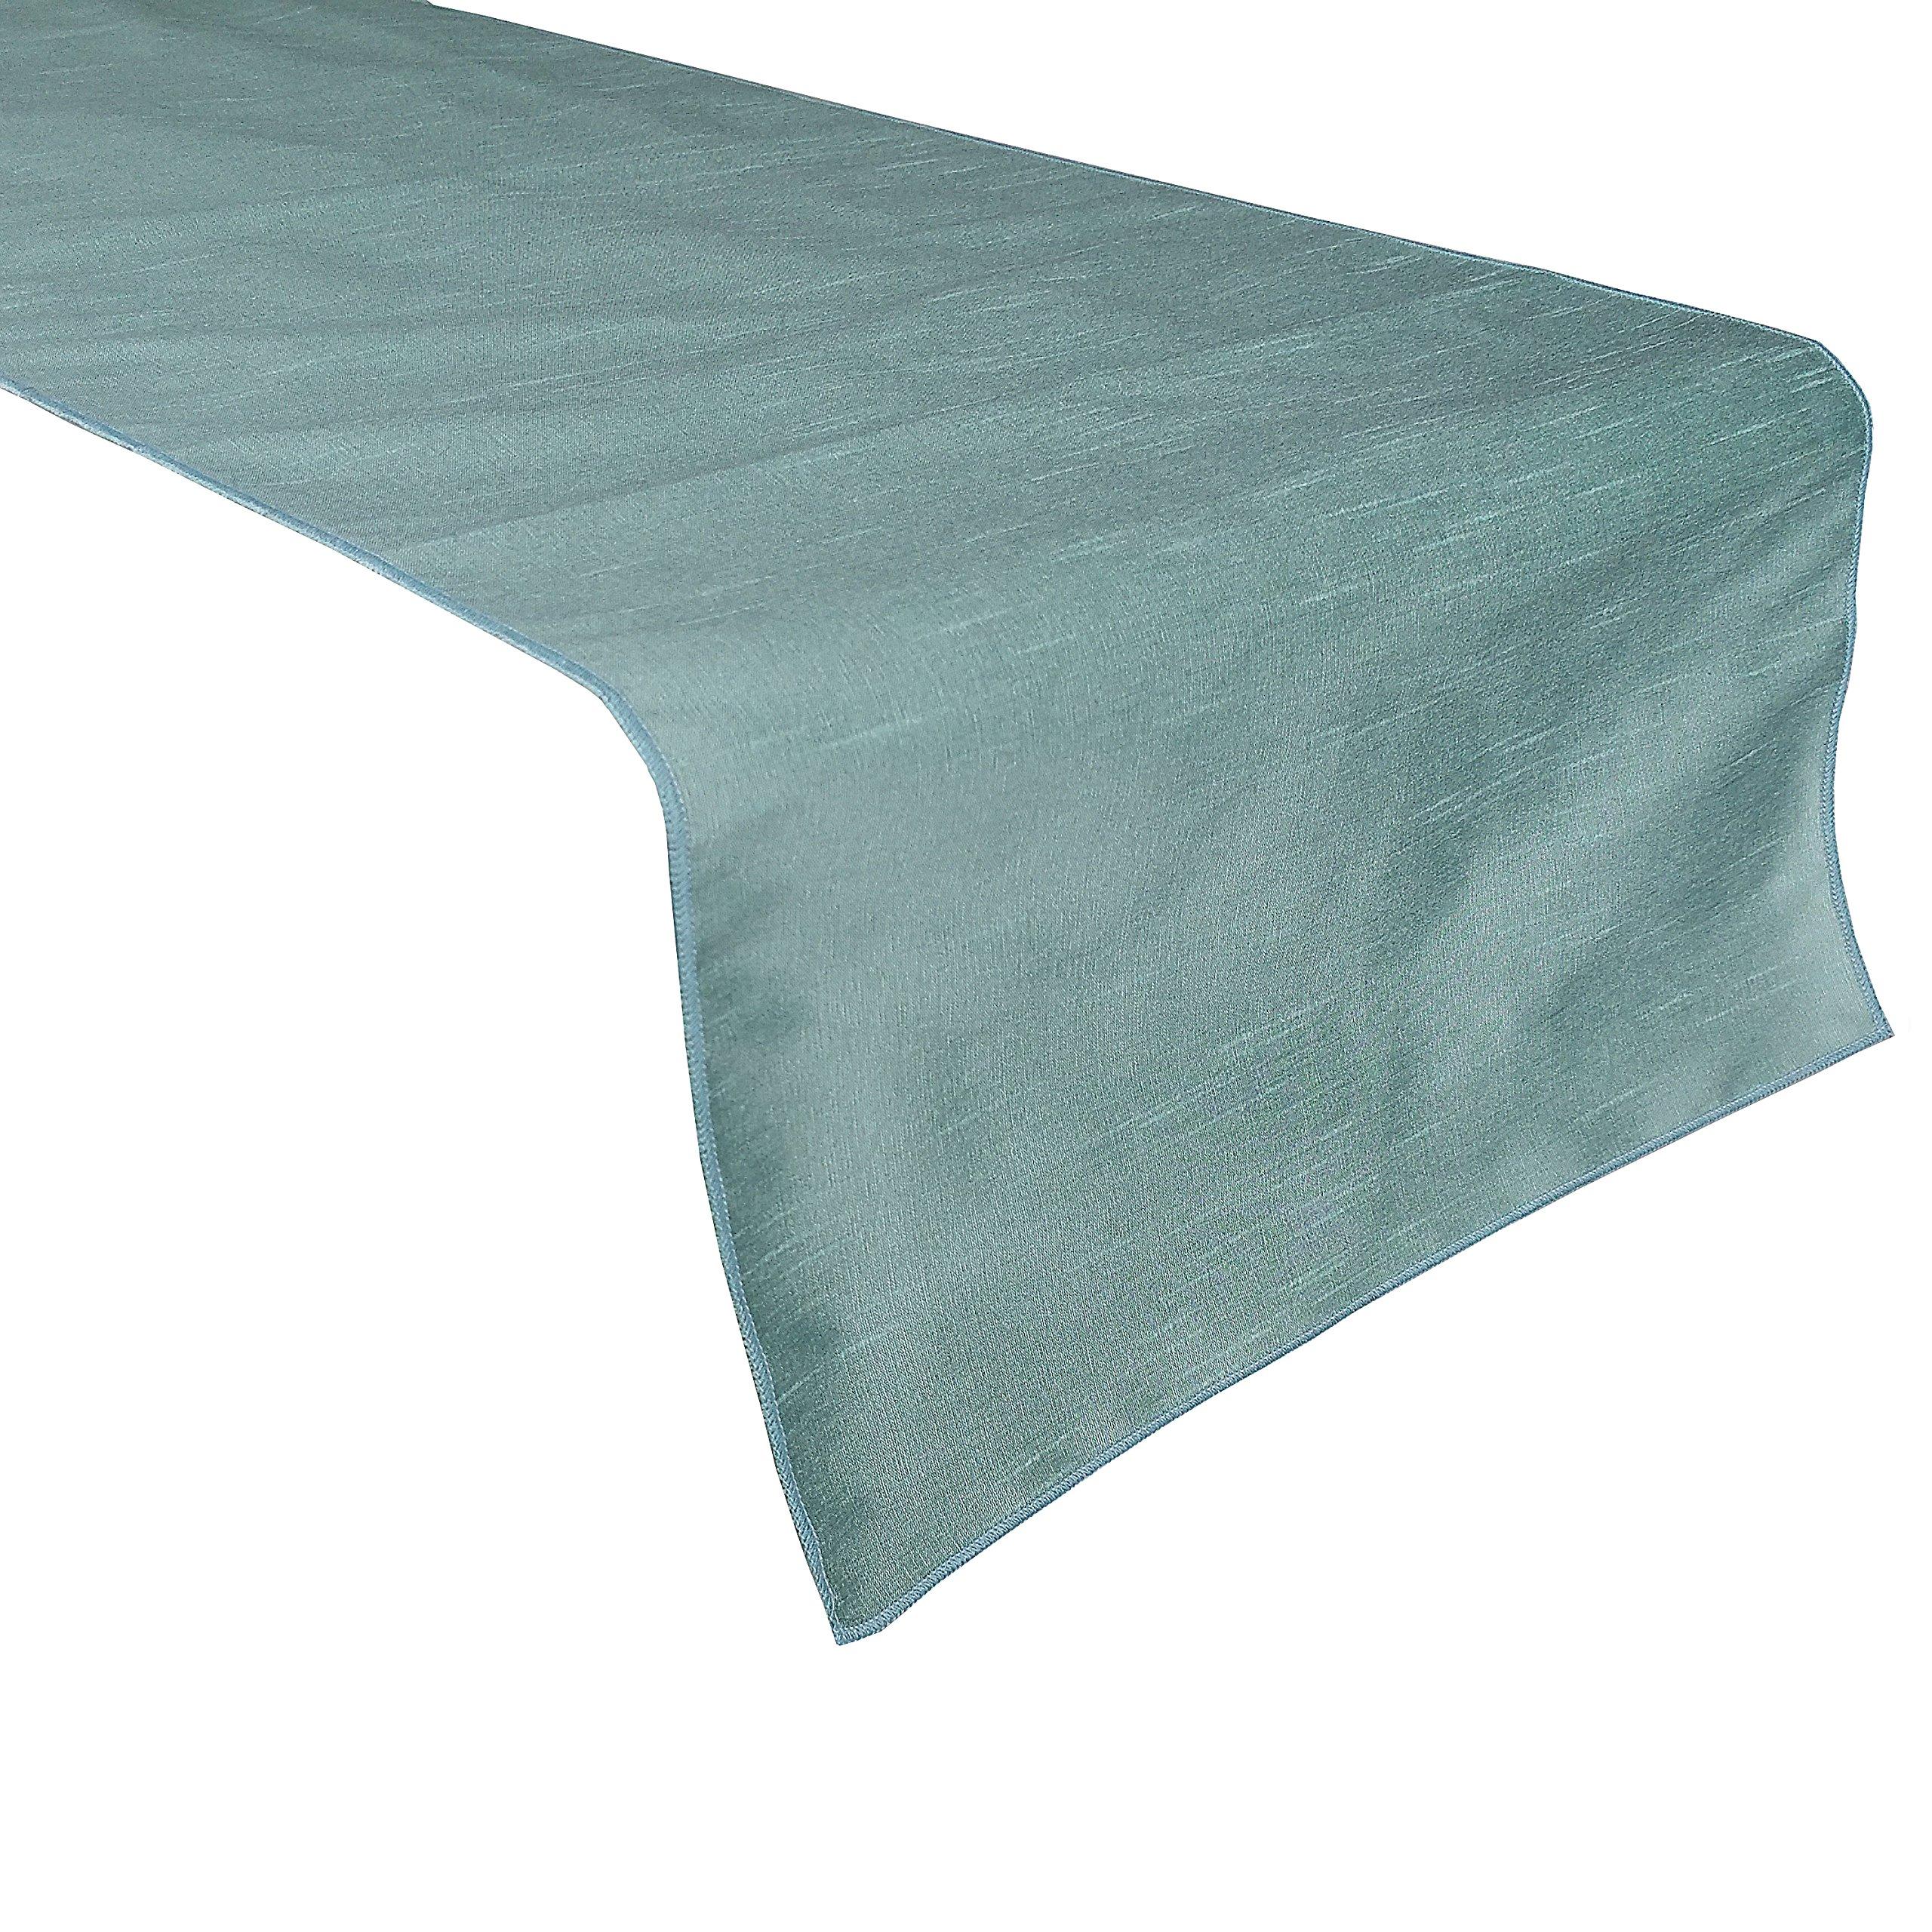 Zen Creative Designs® Elegant Solid Dupioni Table Top Runner (13'' x 72'', Spa)